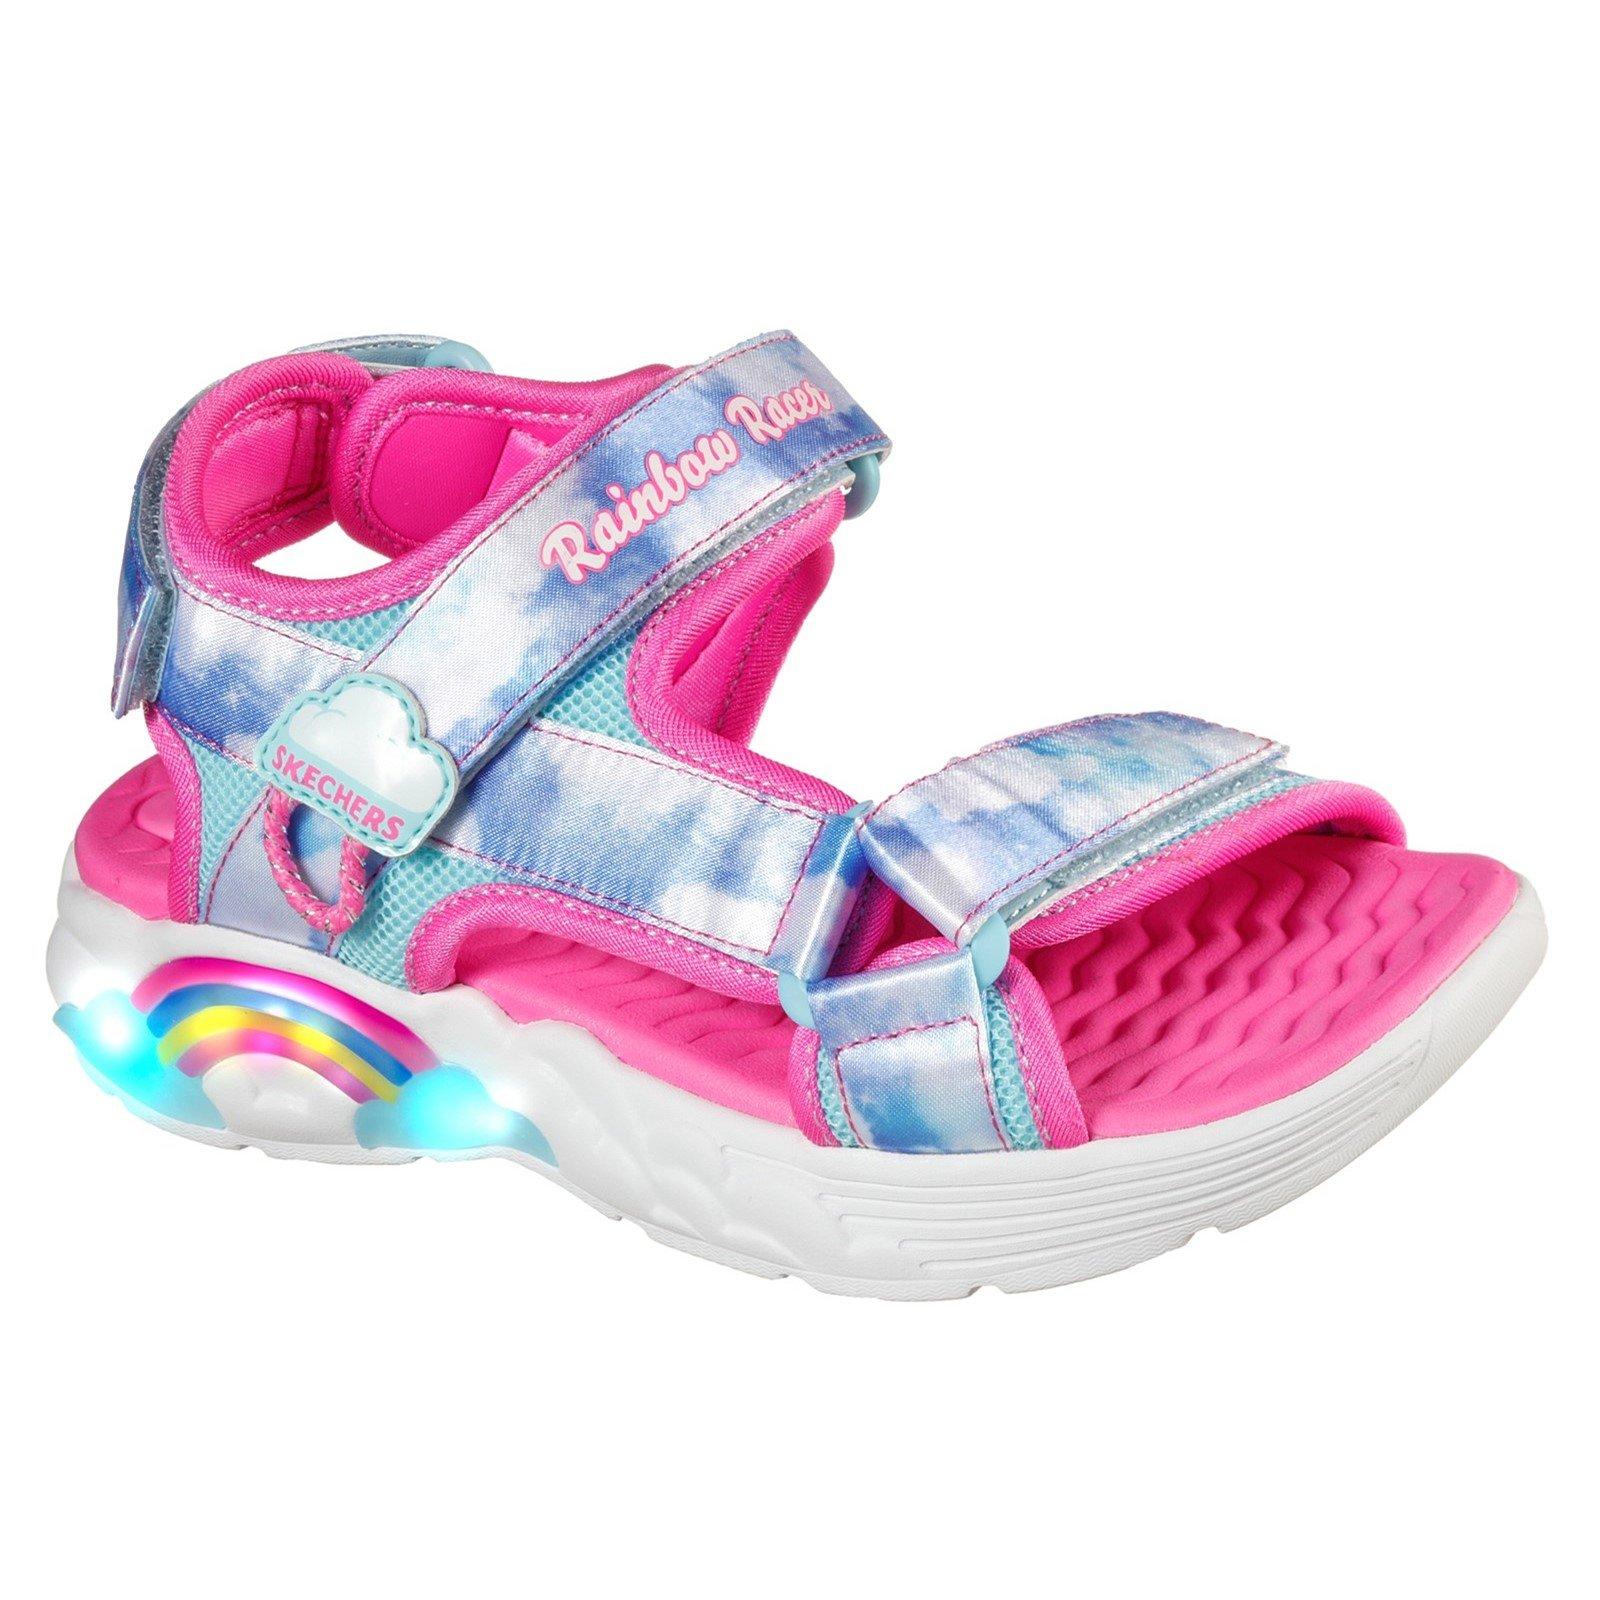 Skechers Unisex Rainbow Racer Summer Sky Beach Sandals Multicolor 32096 - Pink/Light Blue Pu 5